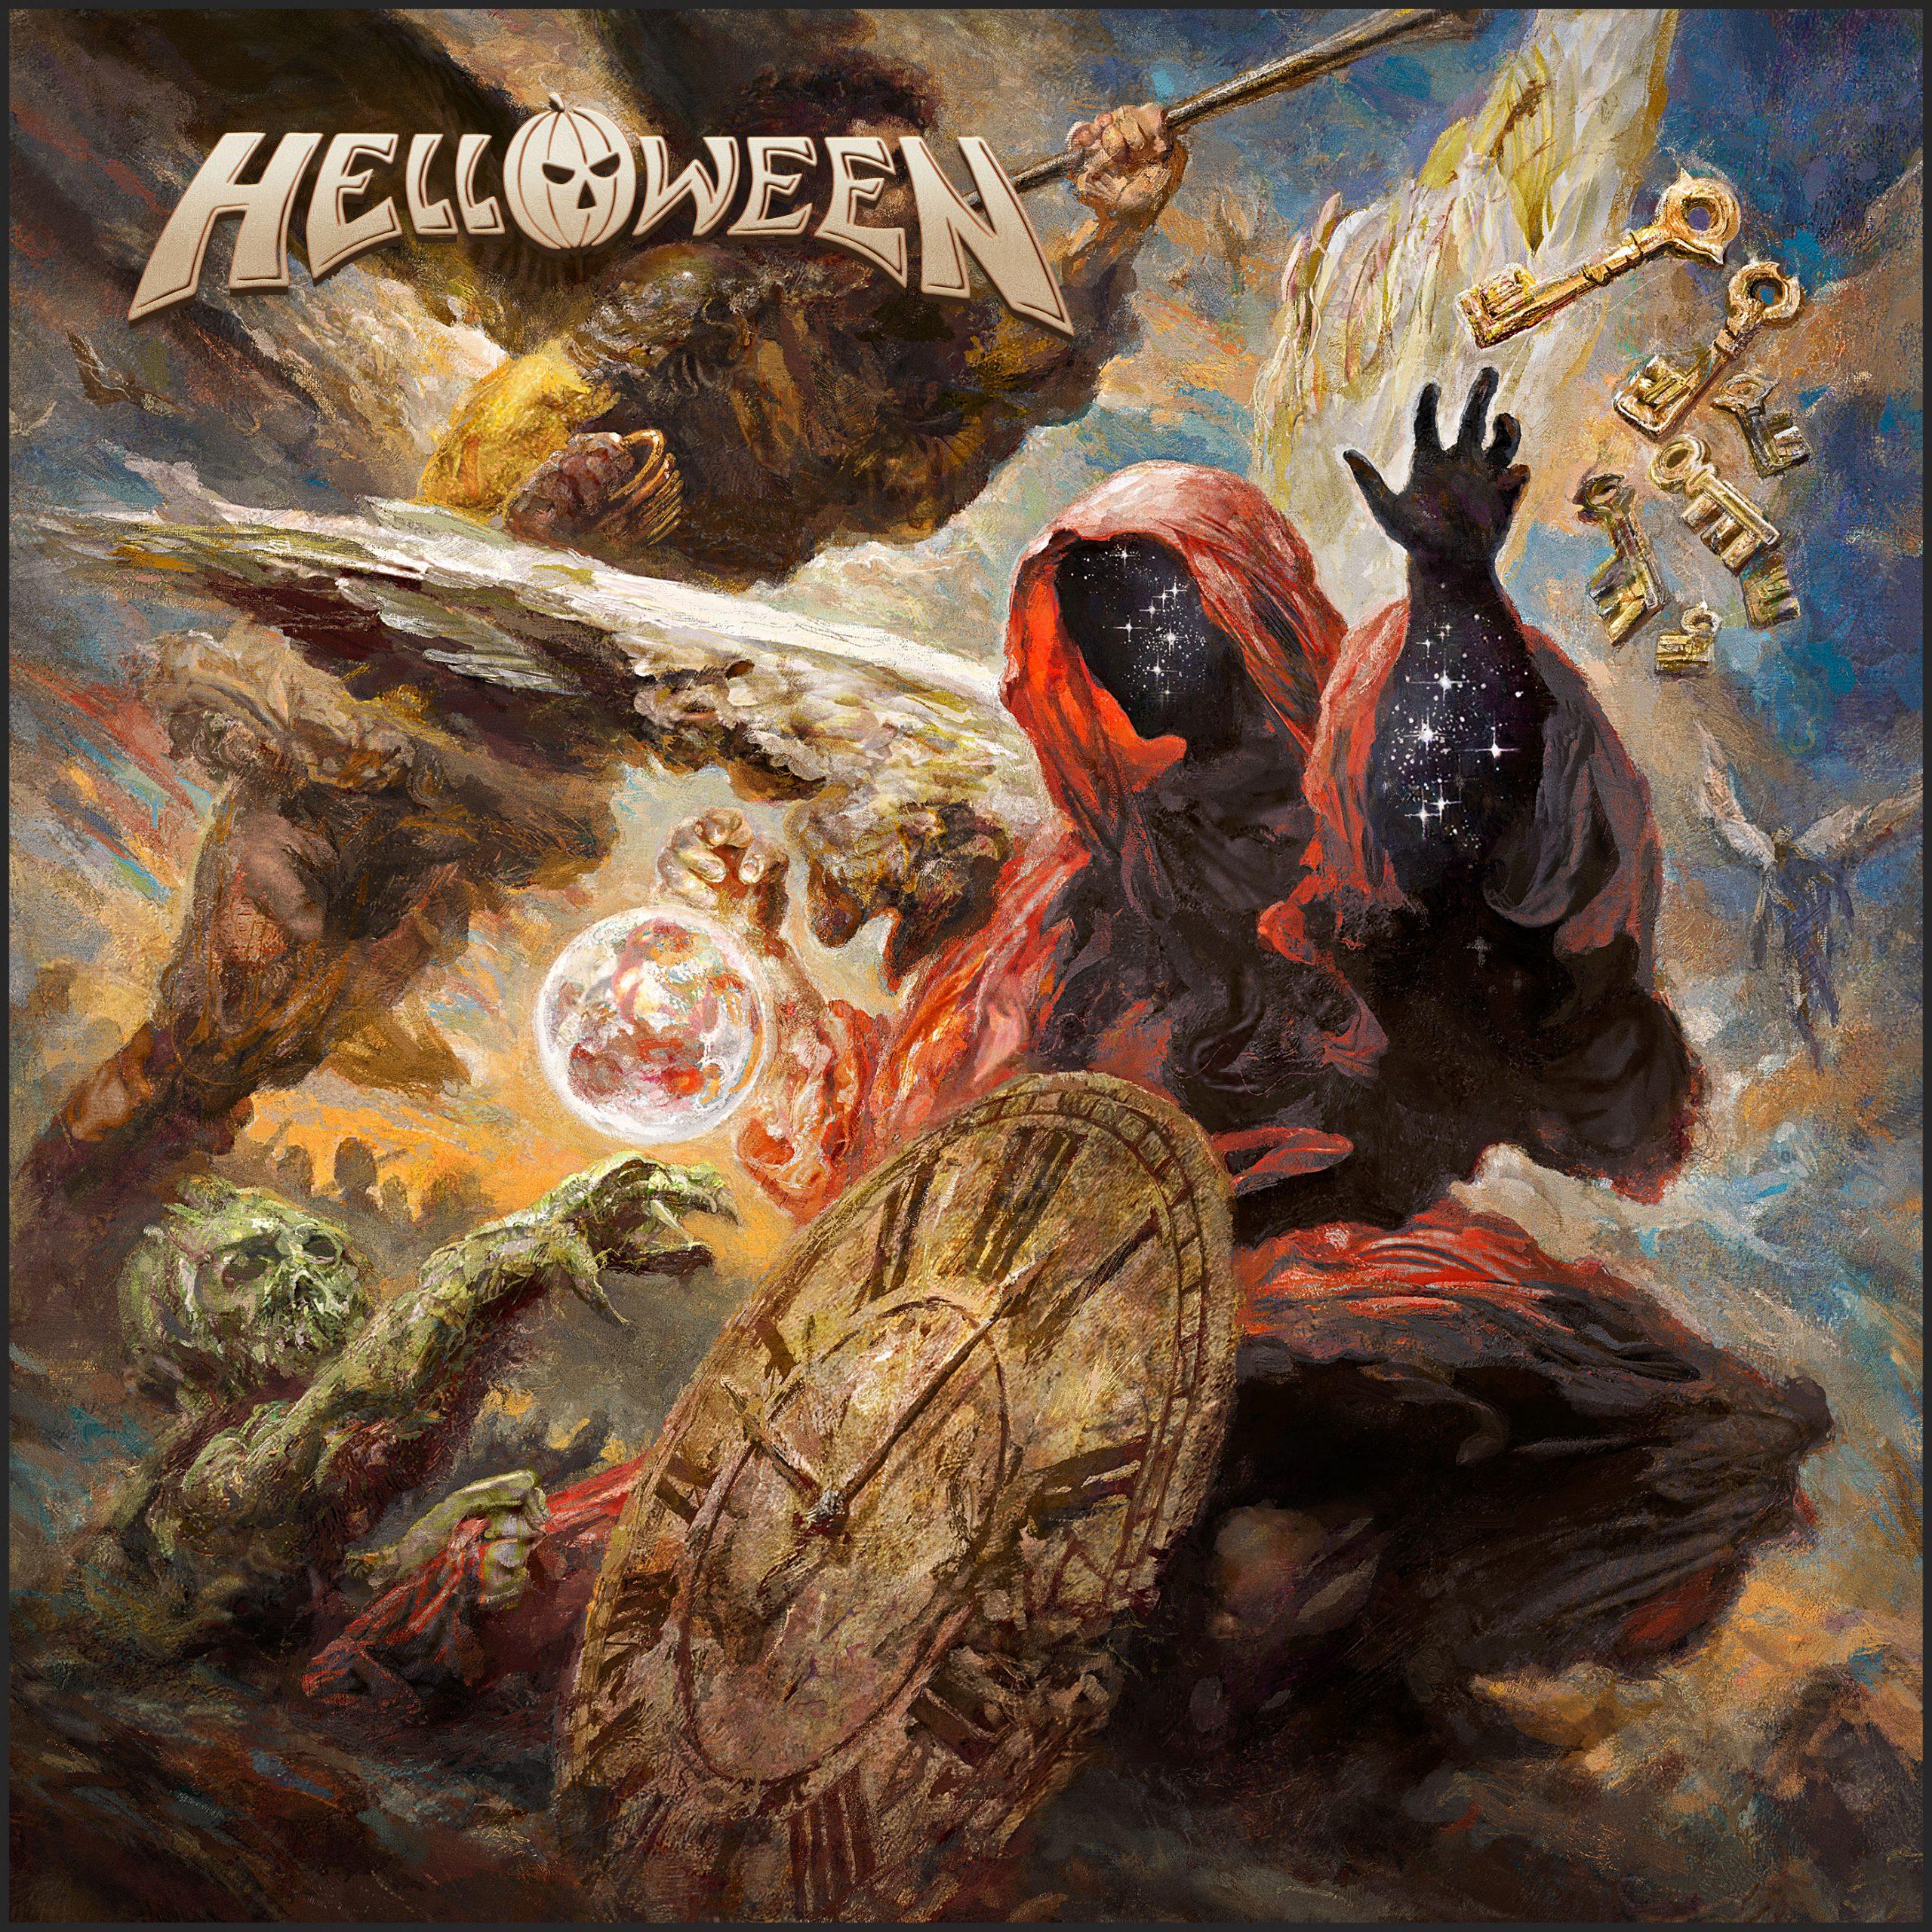 helloween-helloween-ein-album-review